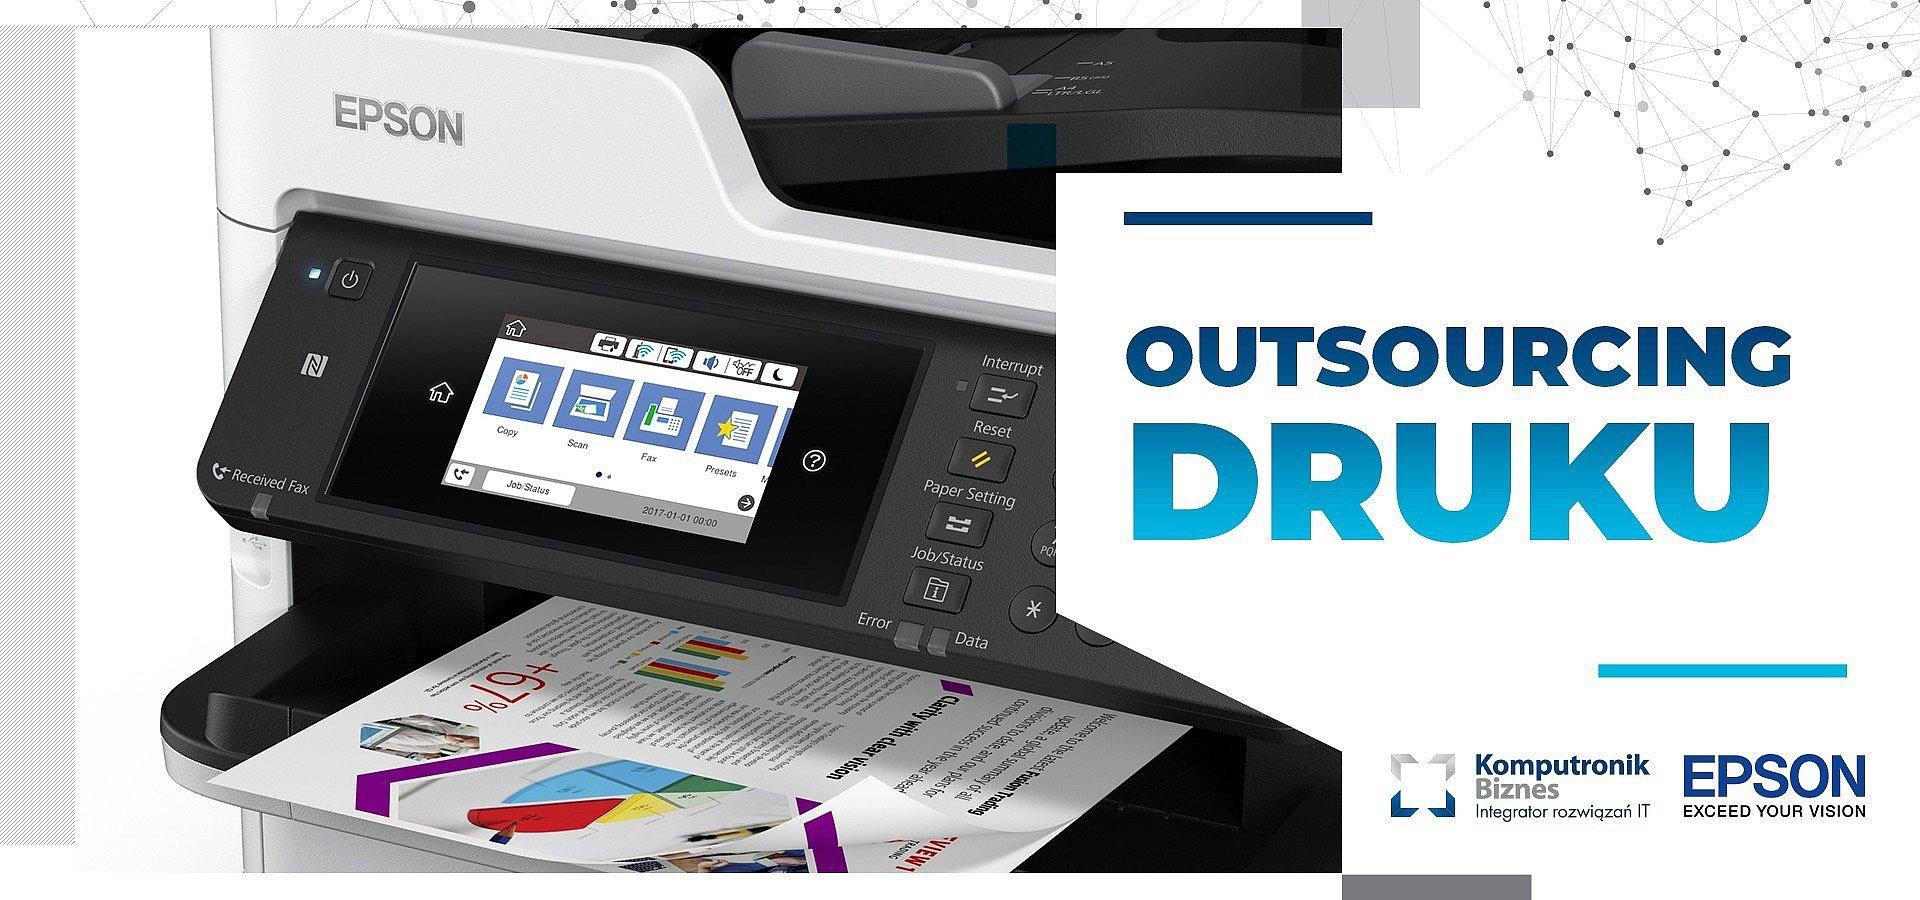 Komputronik Biznes podpisuje kolejne umowy na outsourcing druku